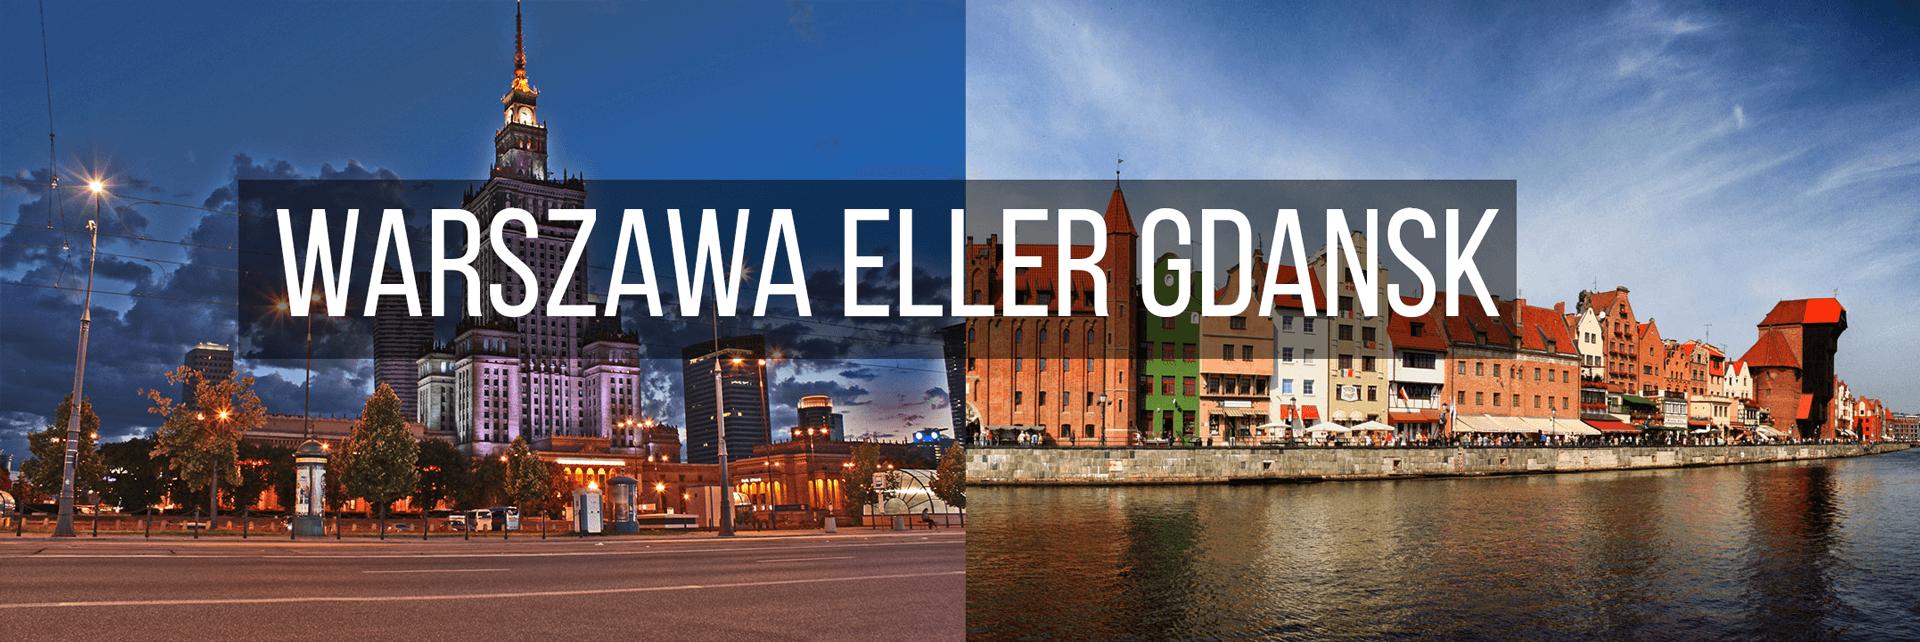 Warszawa eller Gdansk